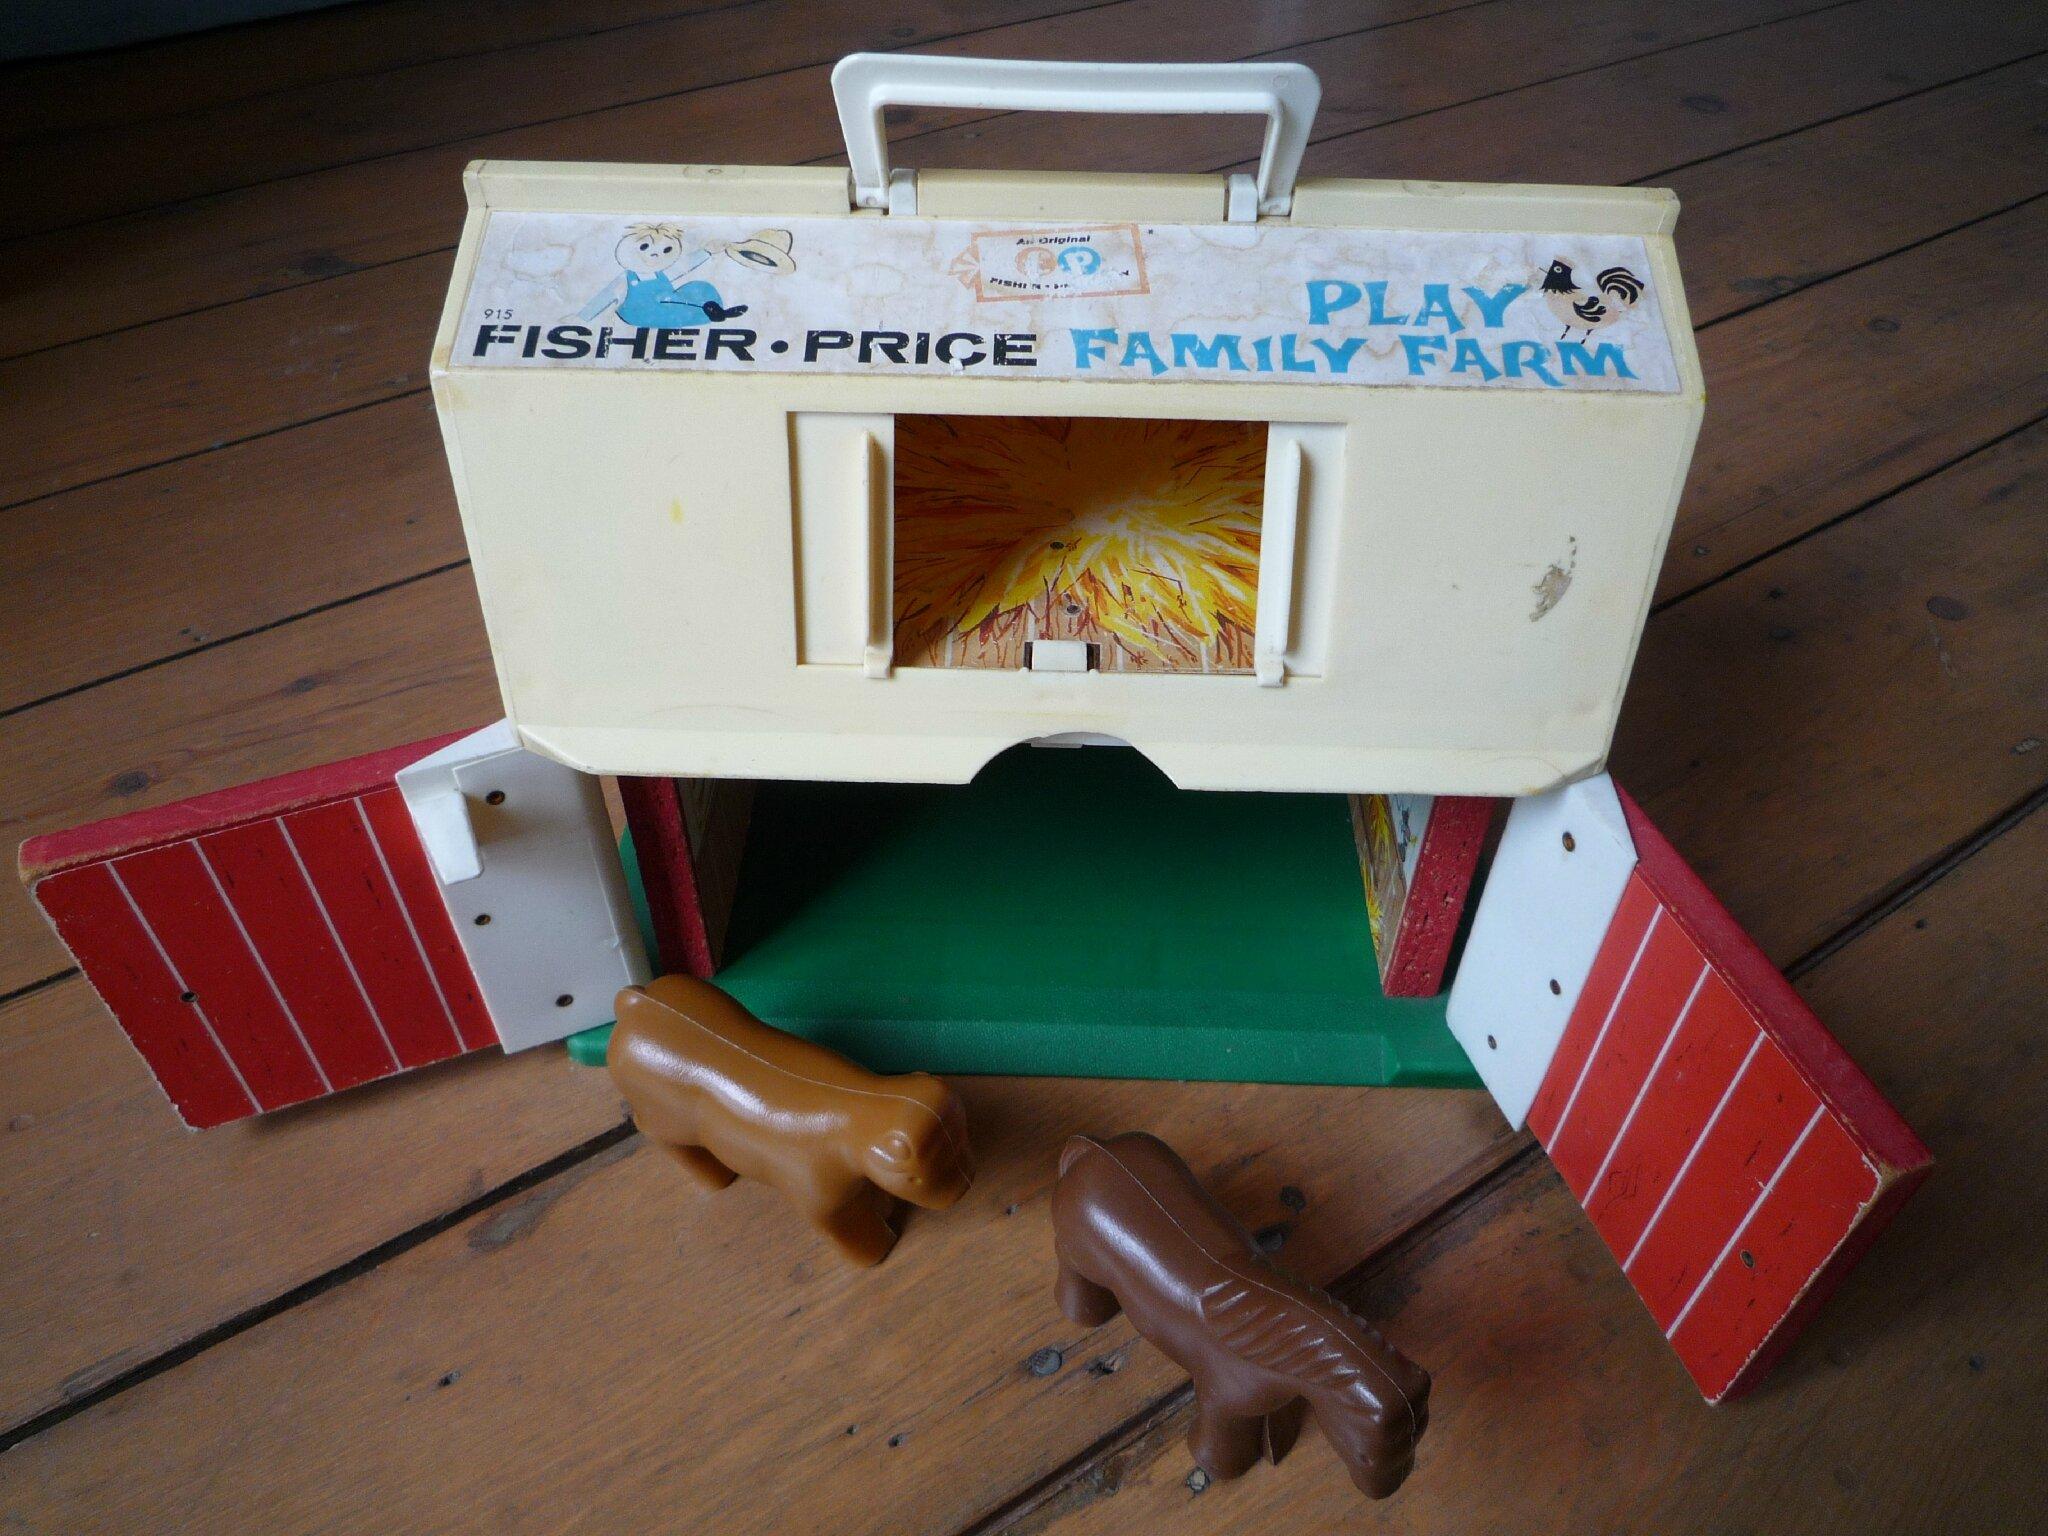 Ferme - Fisher Price